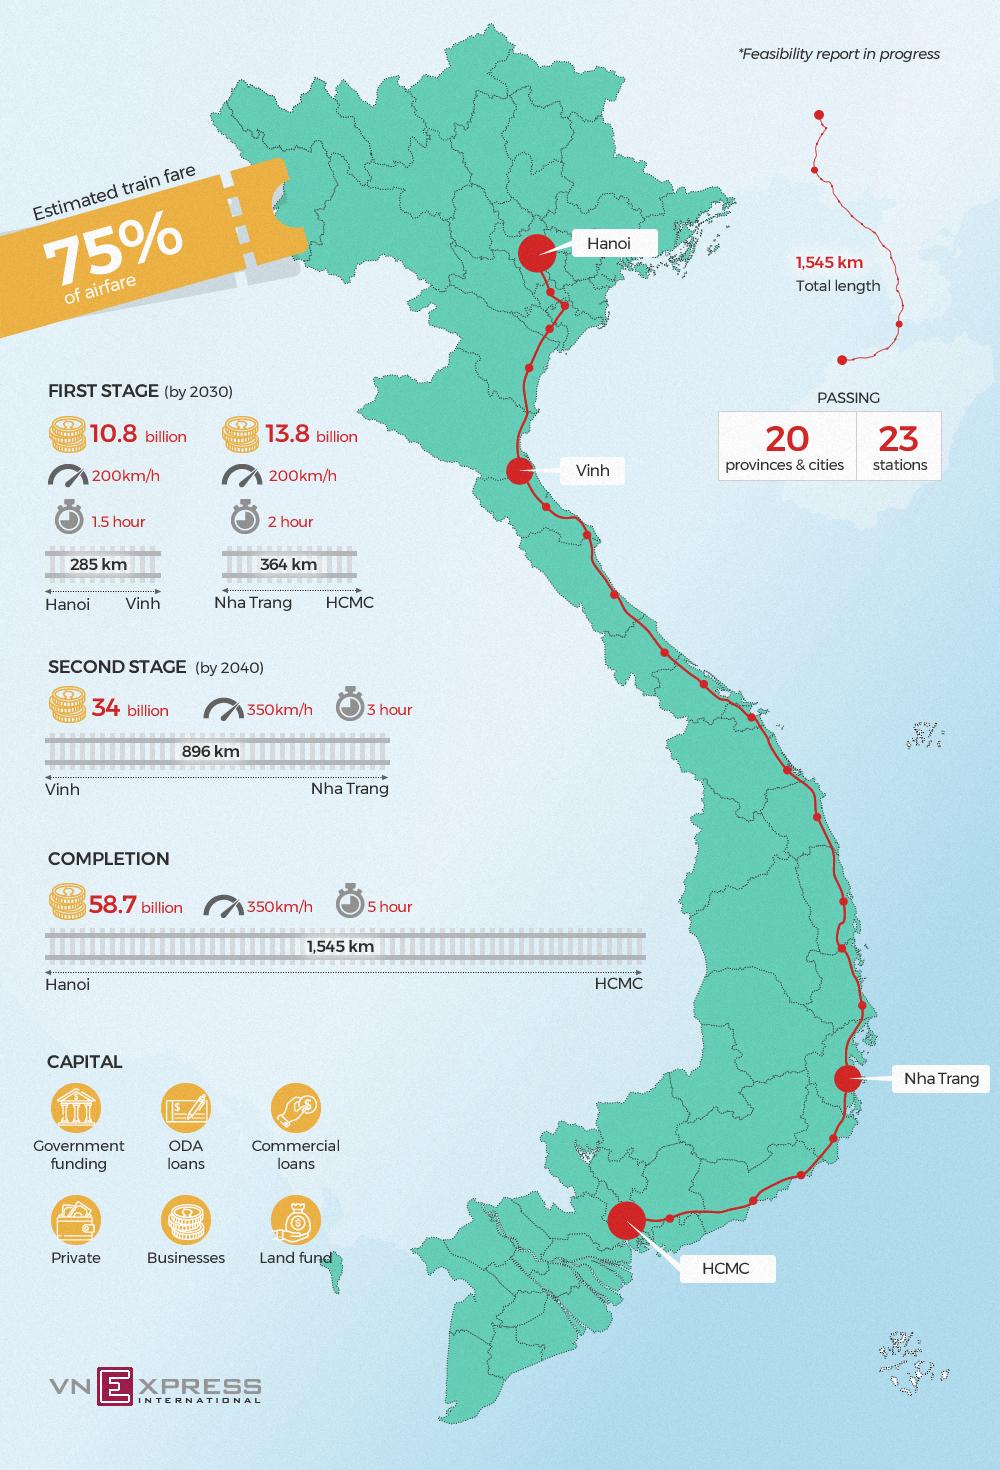 Vietnam's high-speed railway proposal